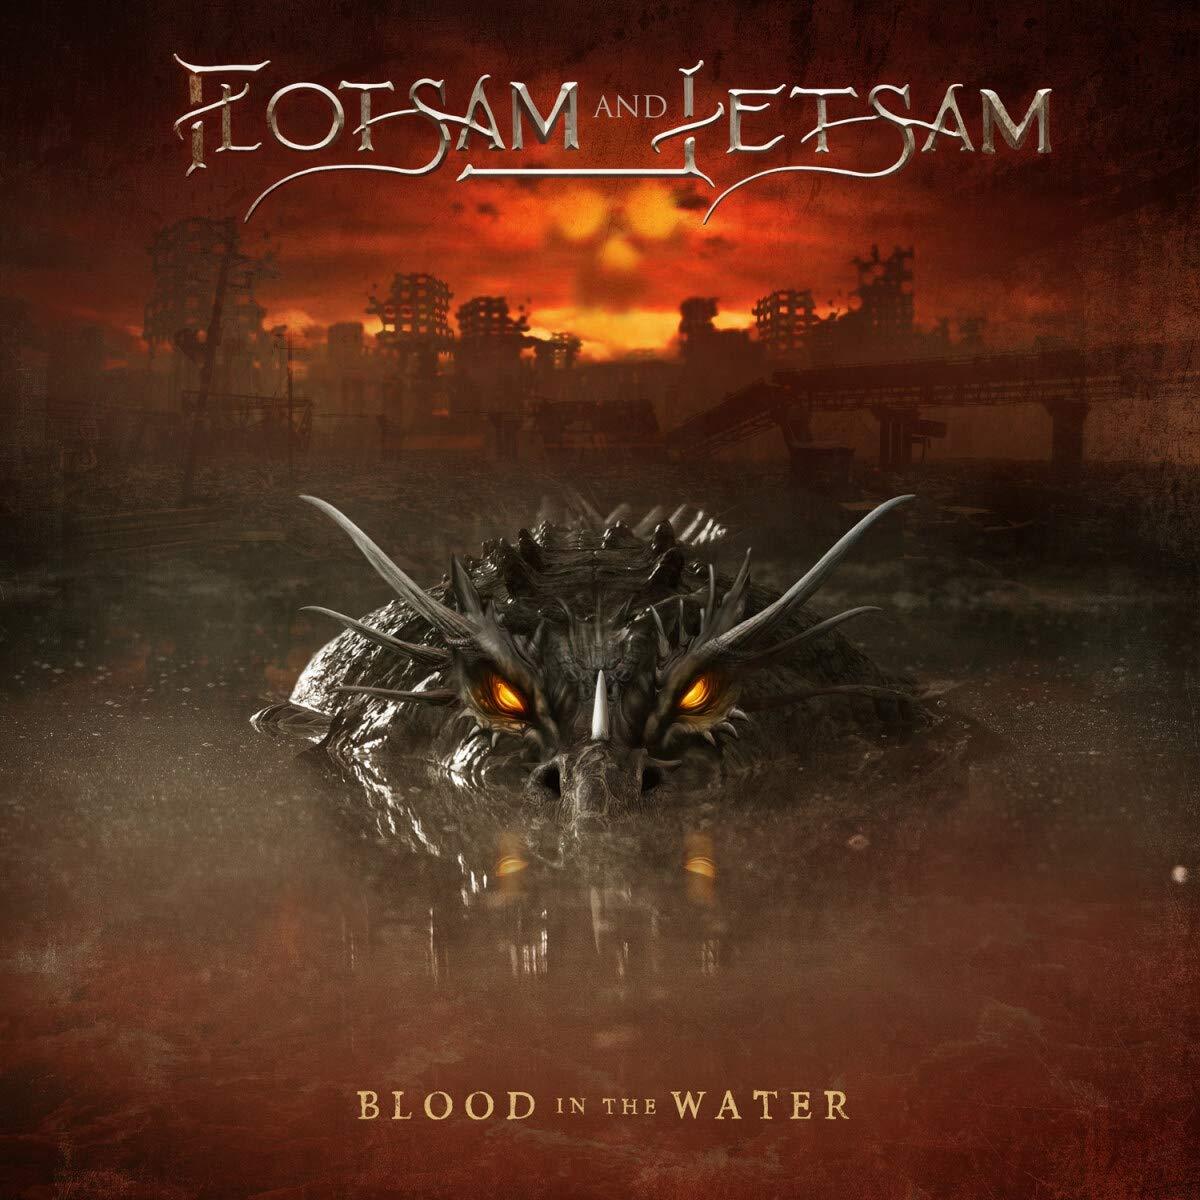 Flotsam & Jetsam - Blood In The Water - Amazon.com Music